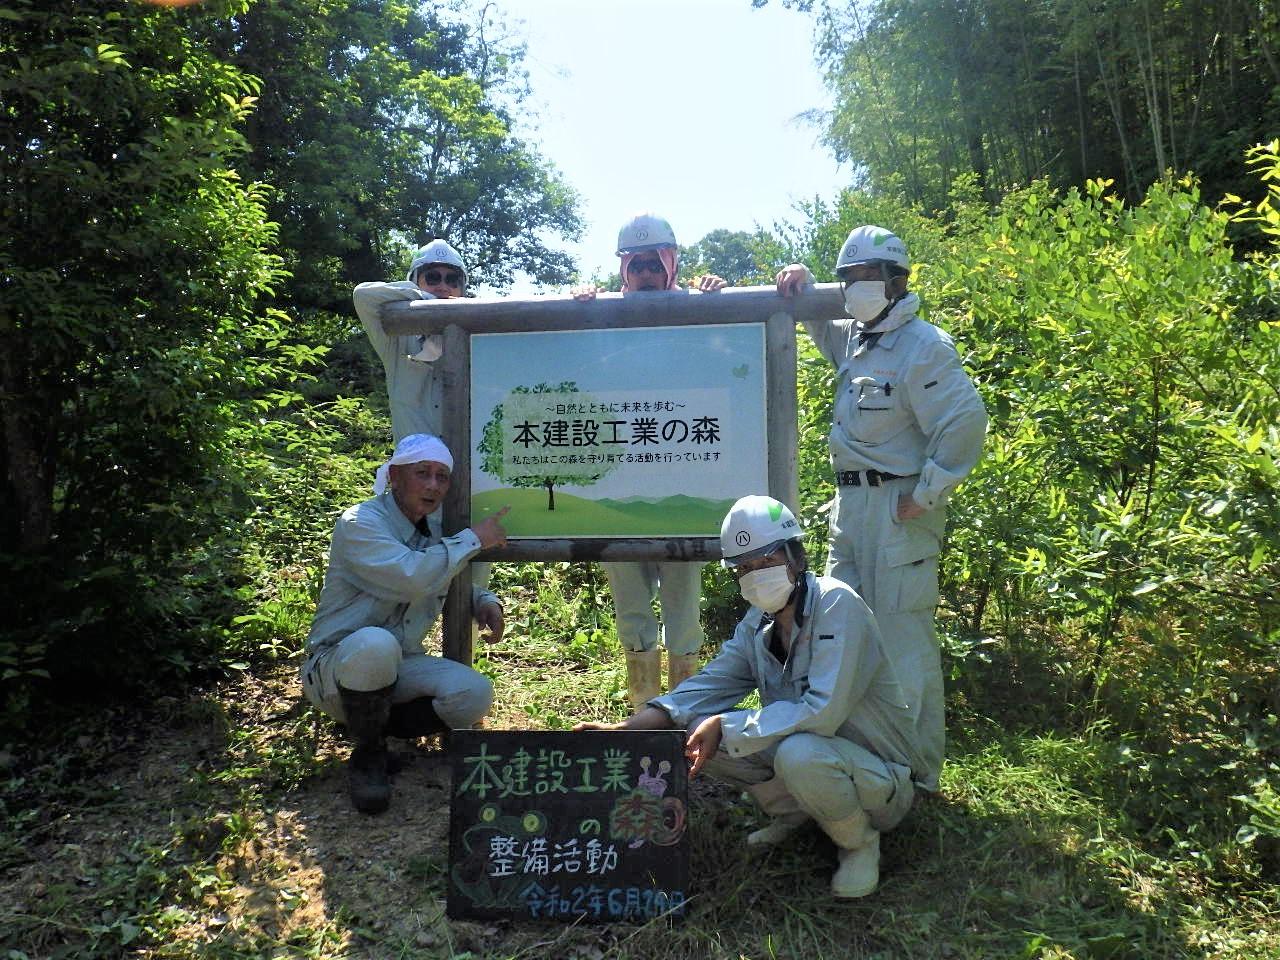 本建設工業の森 活動報告(R2.6)